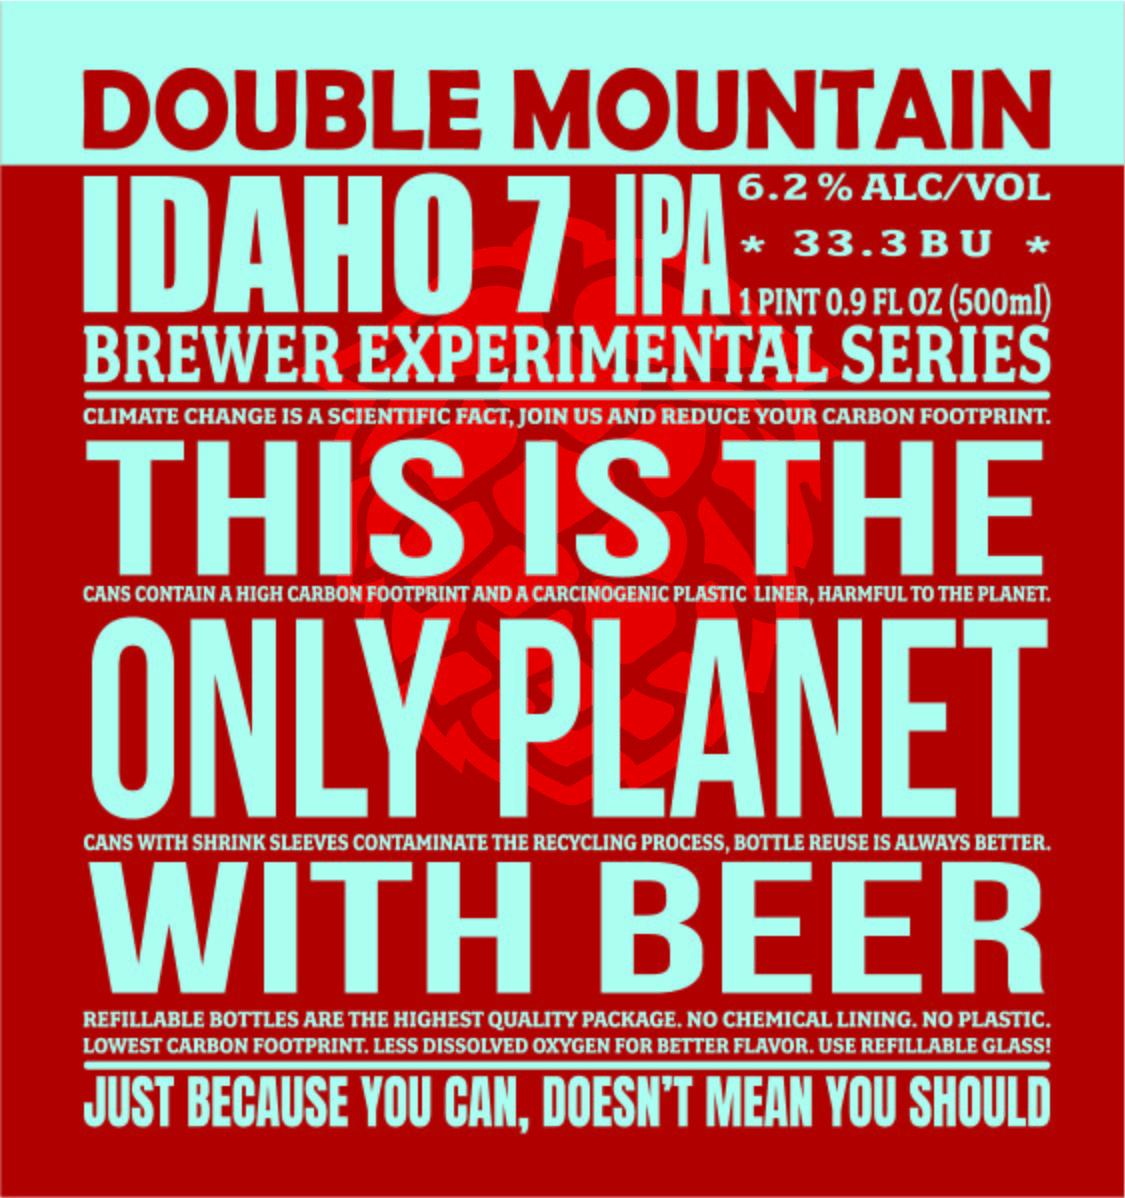 Double Mountain Idaho 7 IPA Label